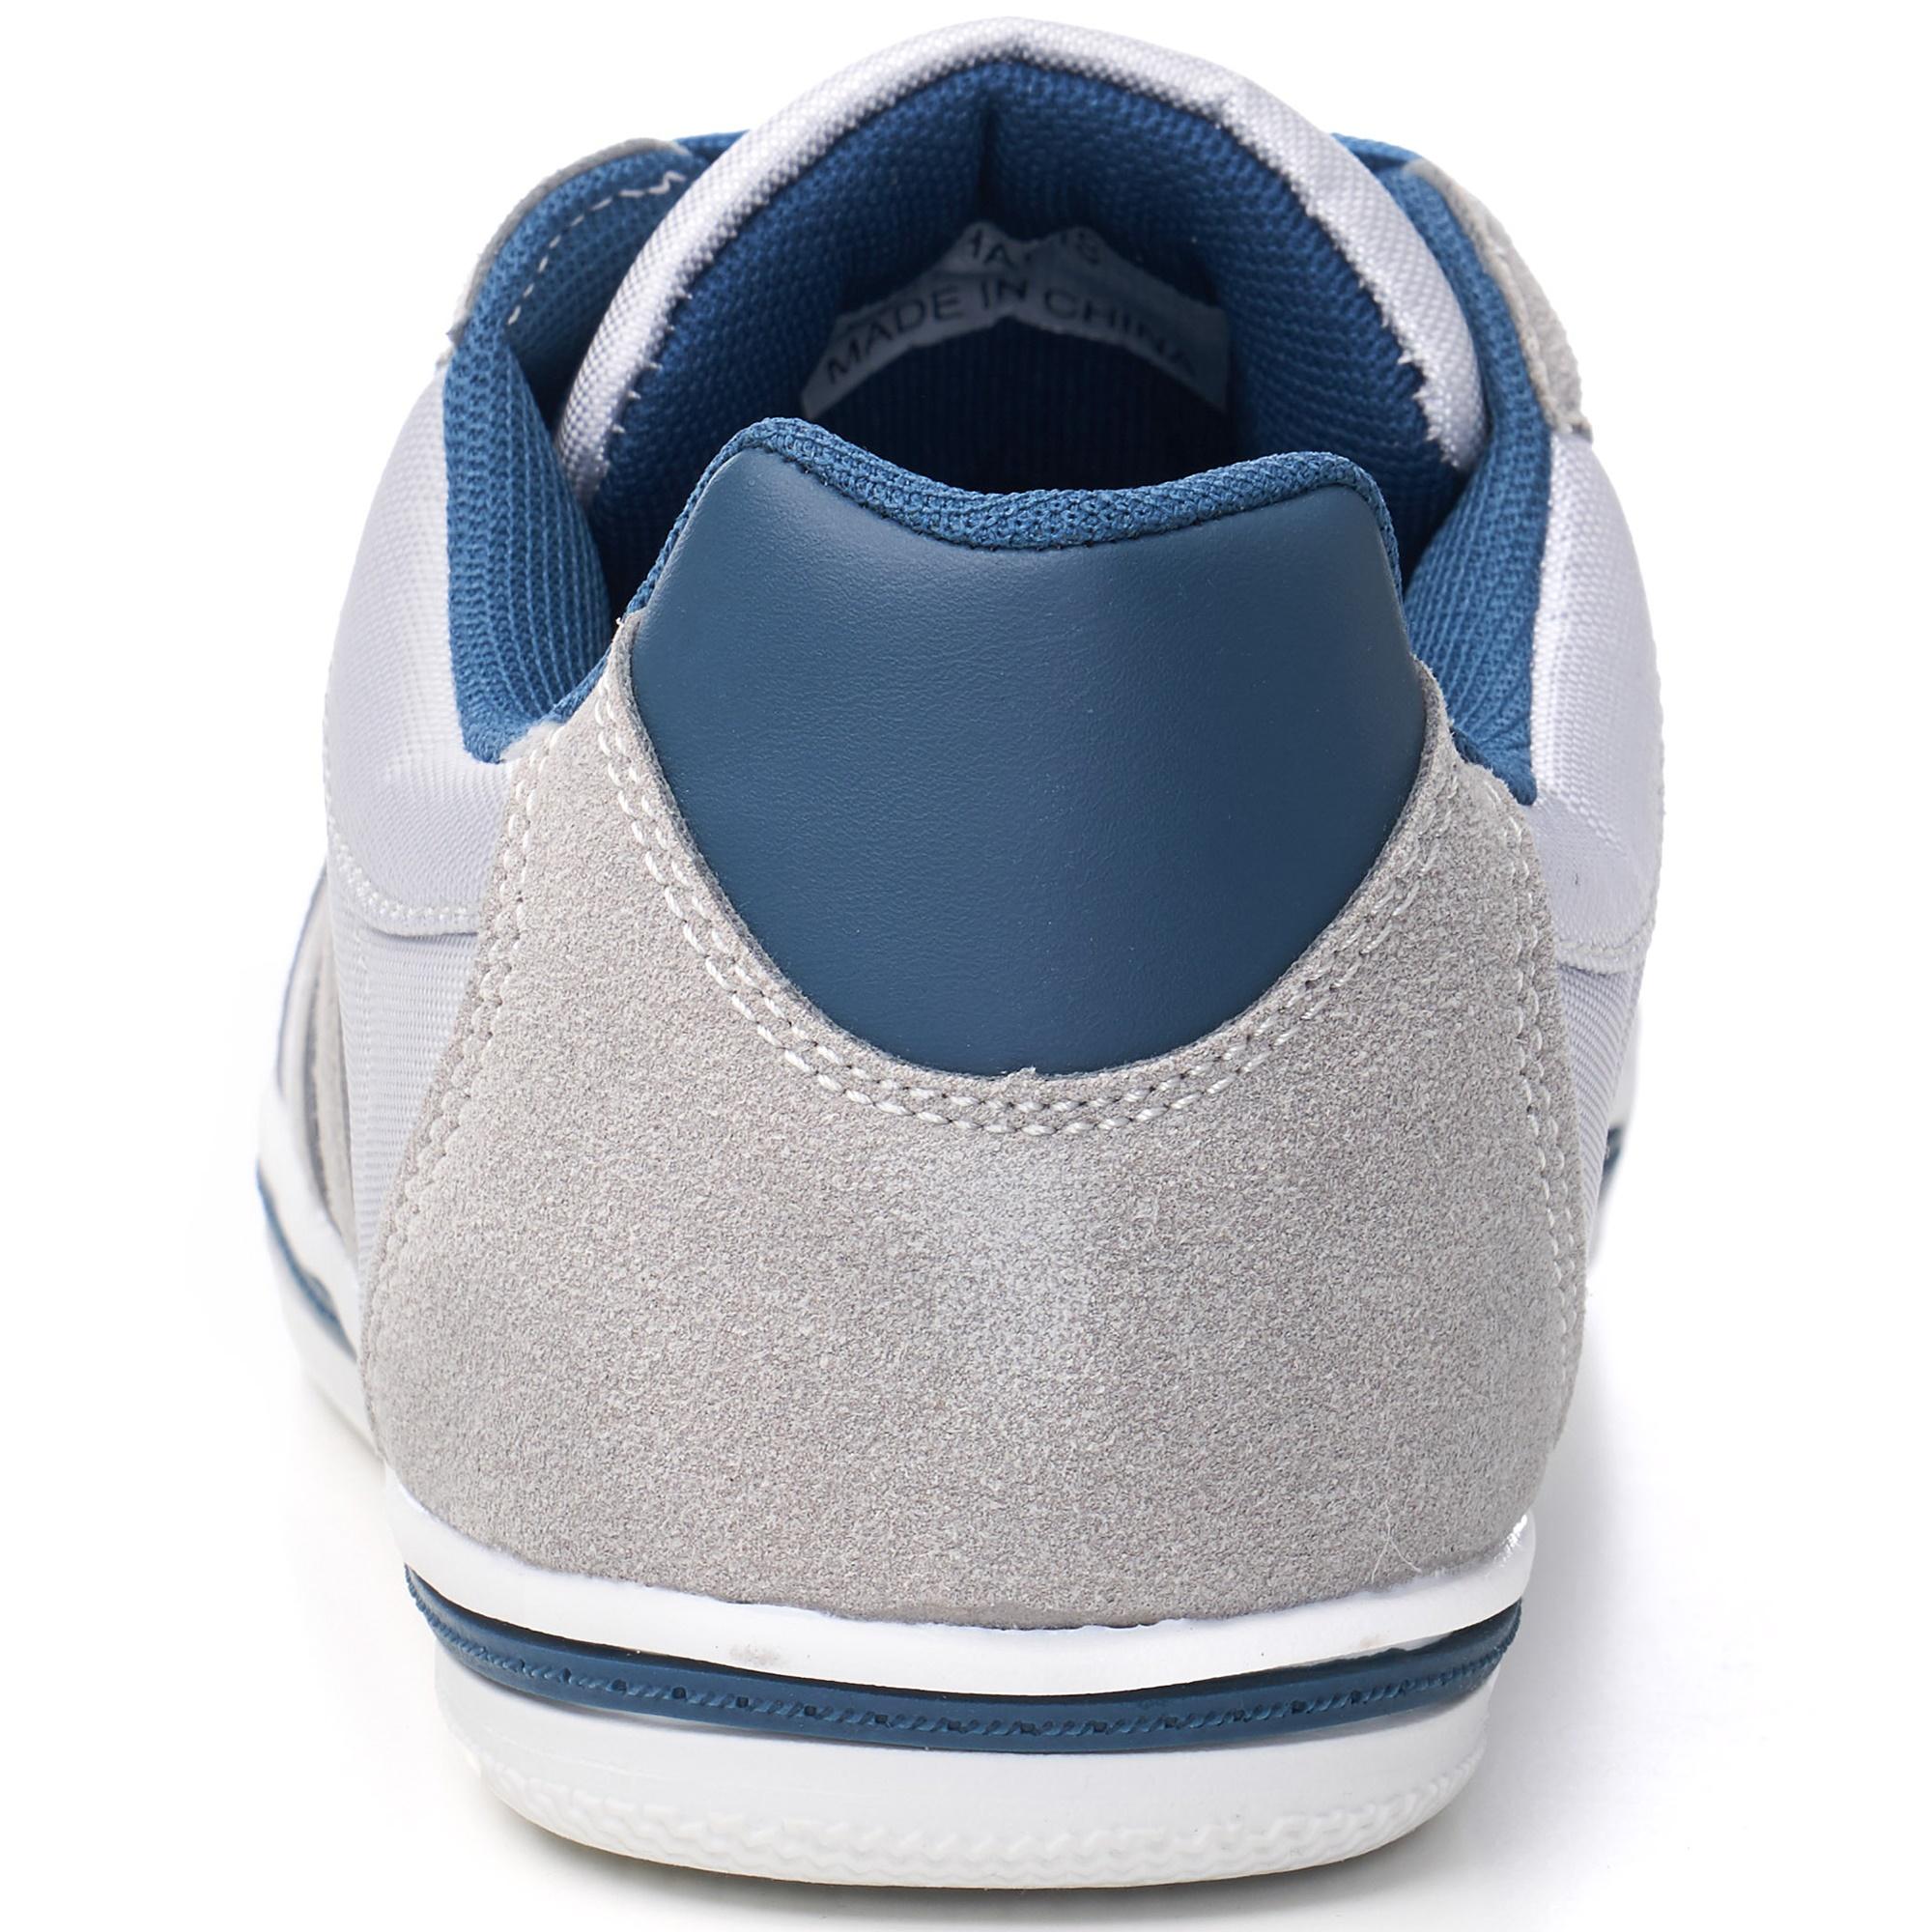 Alpine-Swiss-Haris-Mens-Retro-Striped-Athletic-Shoes-Fashion-Sneaker-Tennis-Shoe thumbnail 13